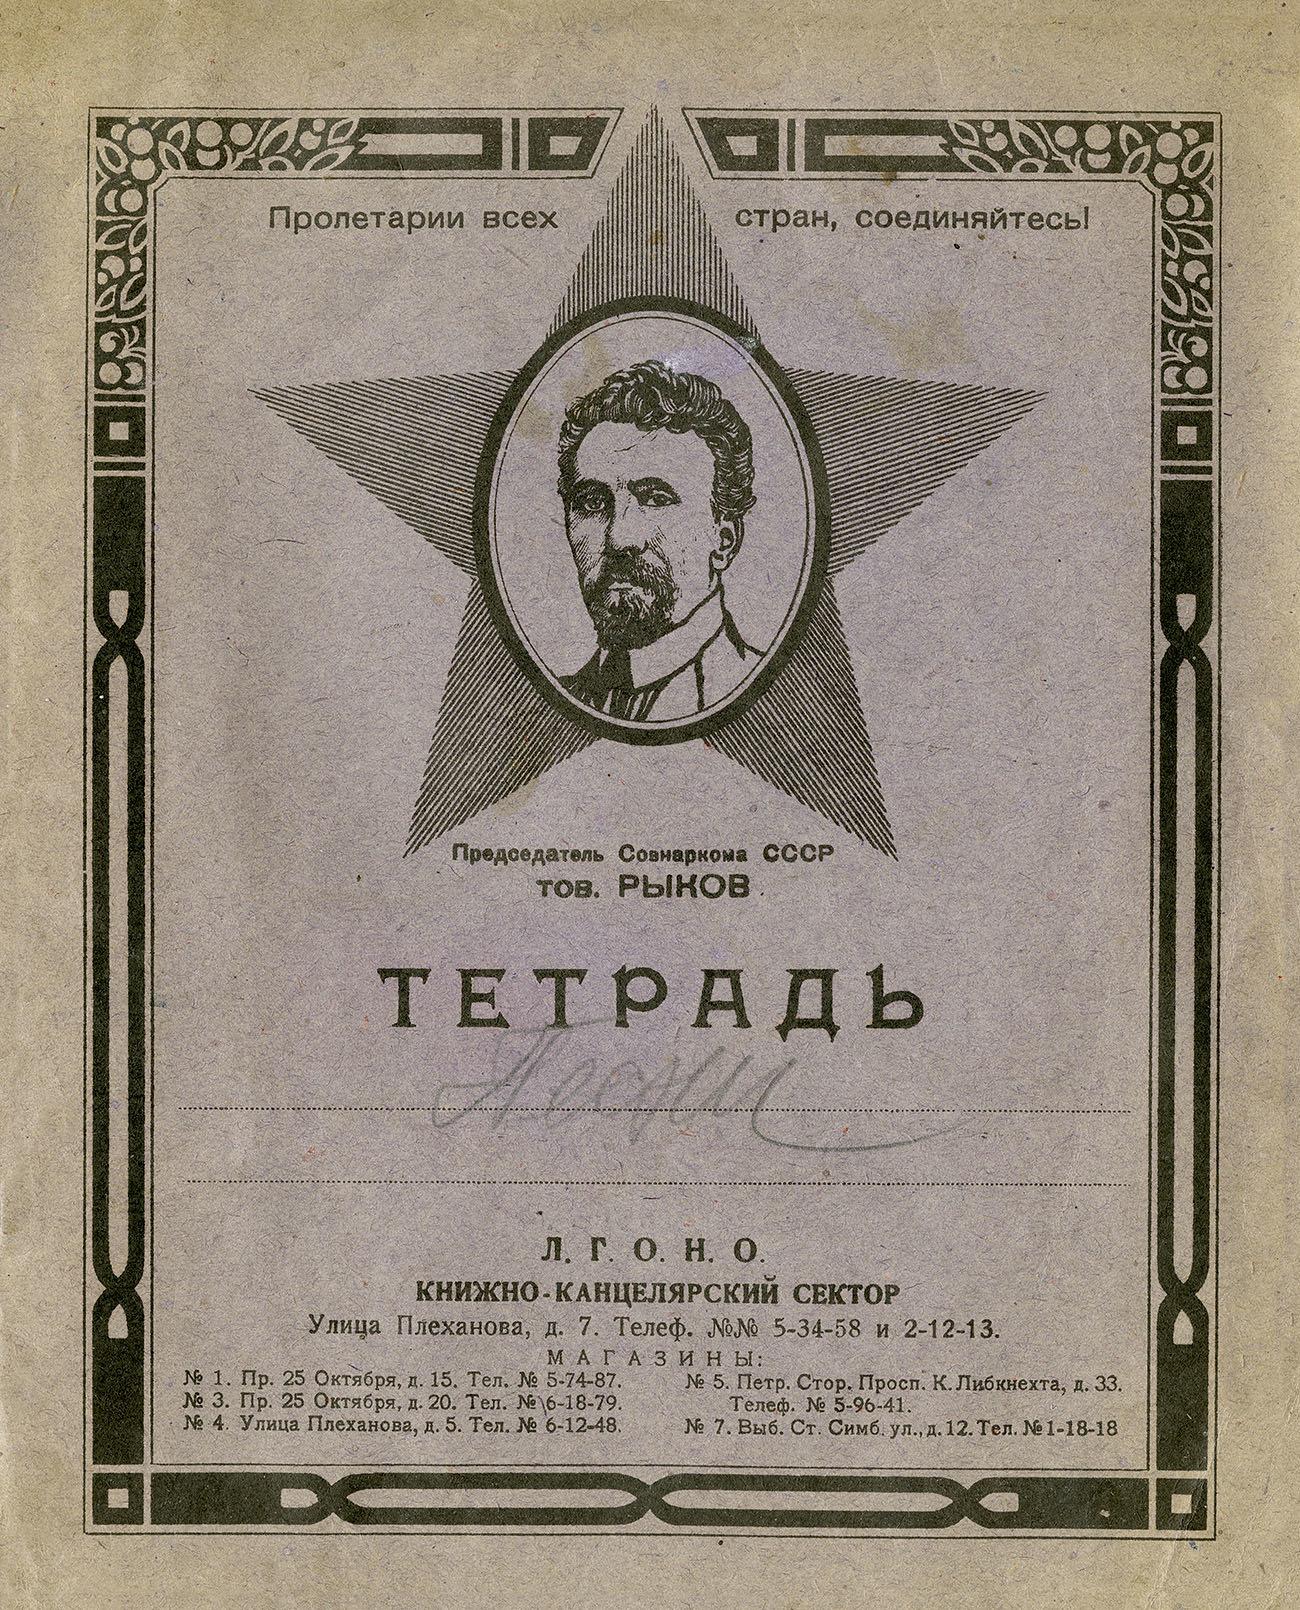 ЛГОНО, Рыков, 175х220